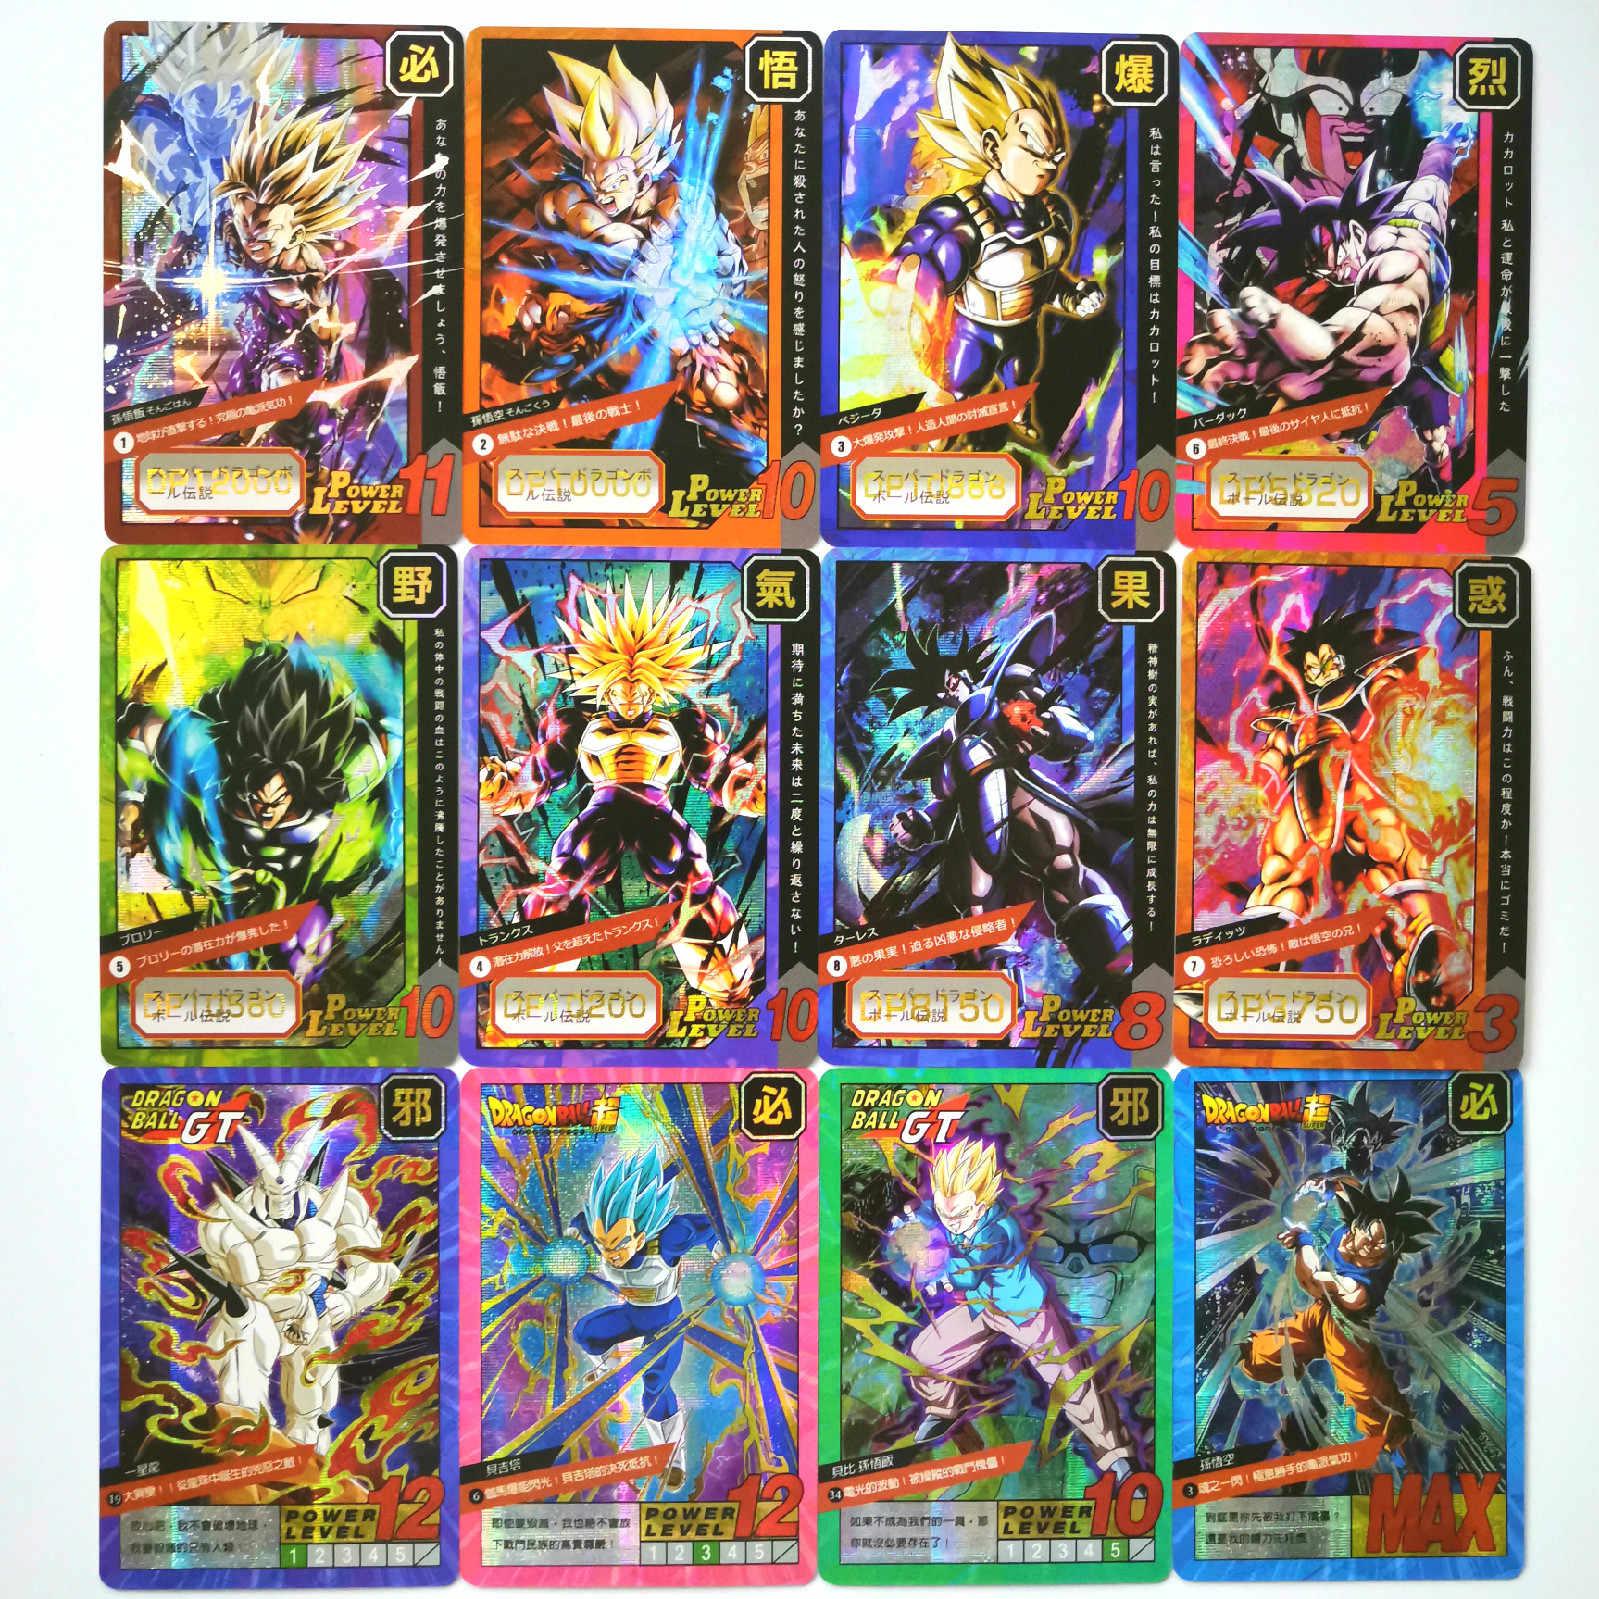 55pcs/set Super Dragon Ball Z 9 in 1 Heroes Battle Card Ultra Instinct Goku Vegeta Game Collection Anime Cards